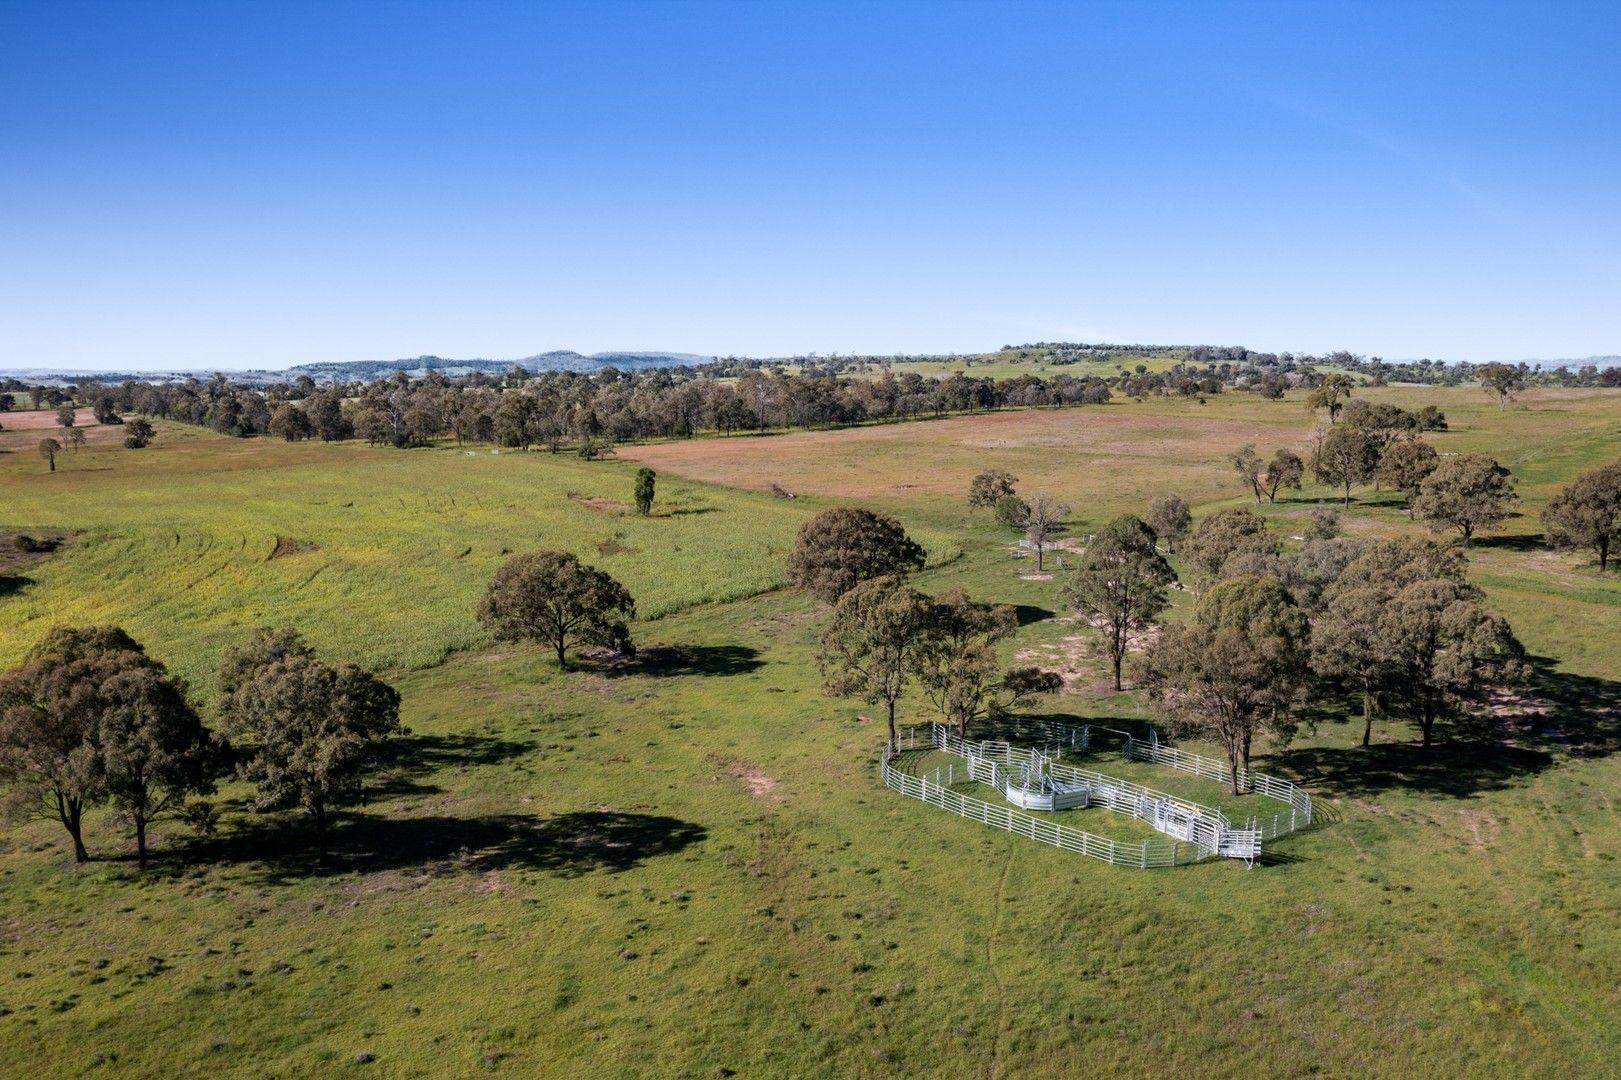 230 ACRES, SCRUB SOIL GRAZING, Peranga QLD 4352, Image 0